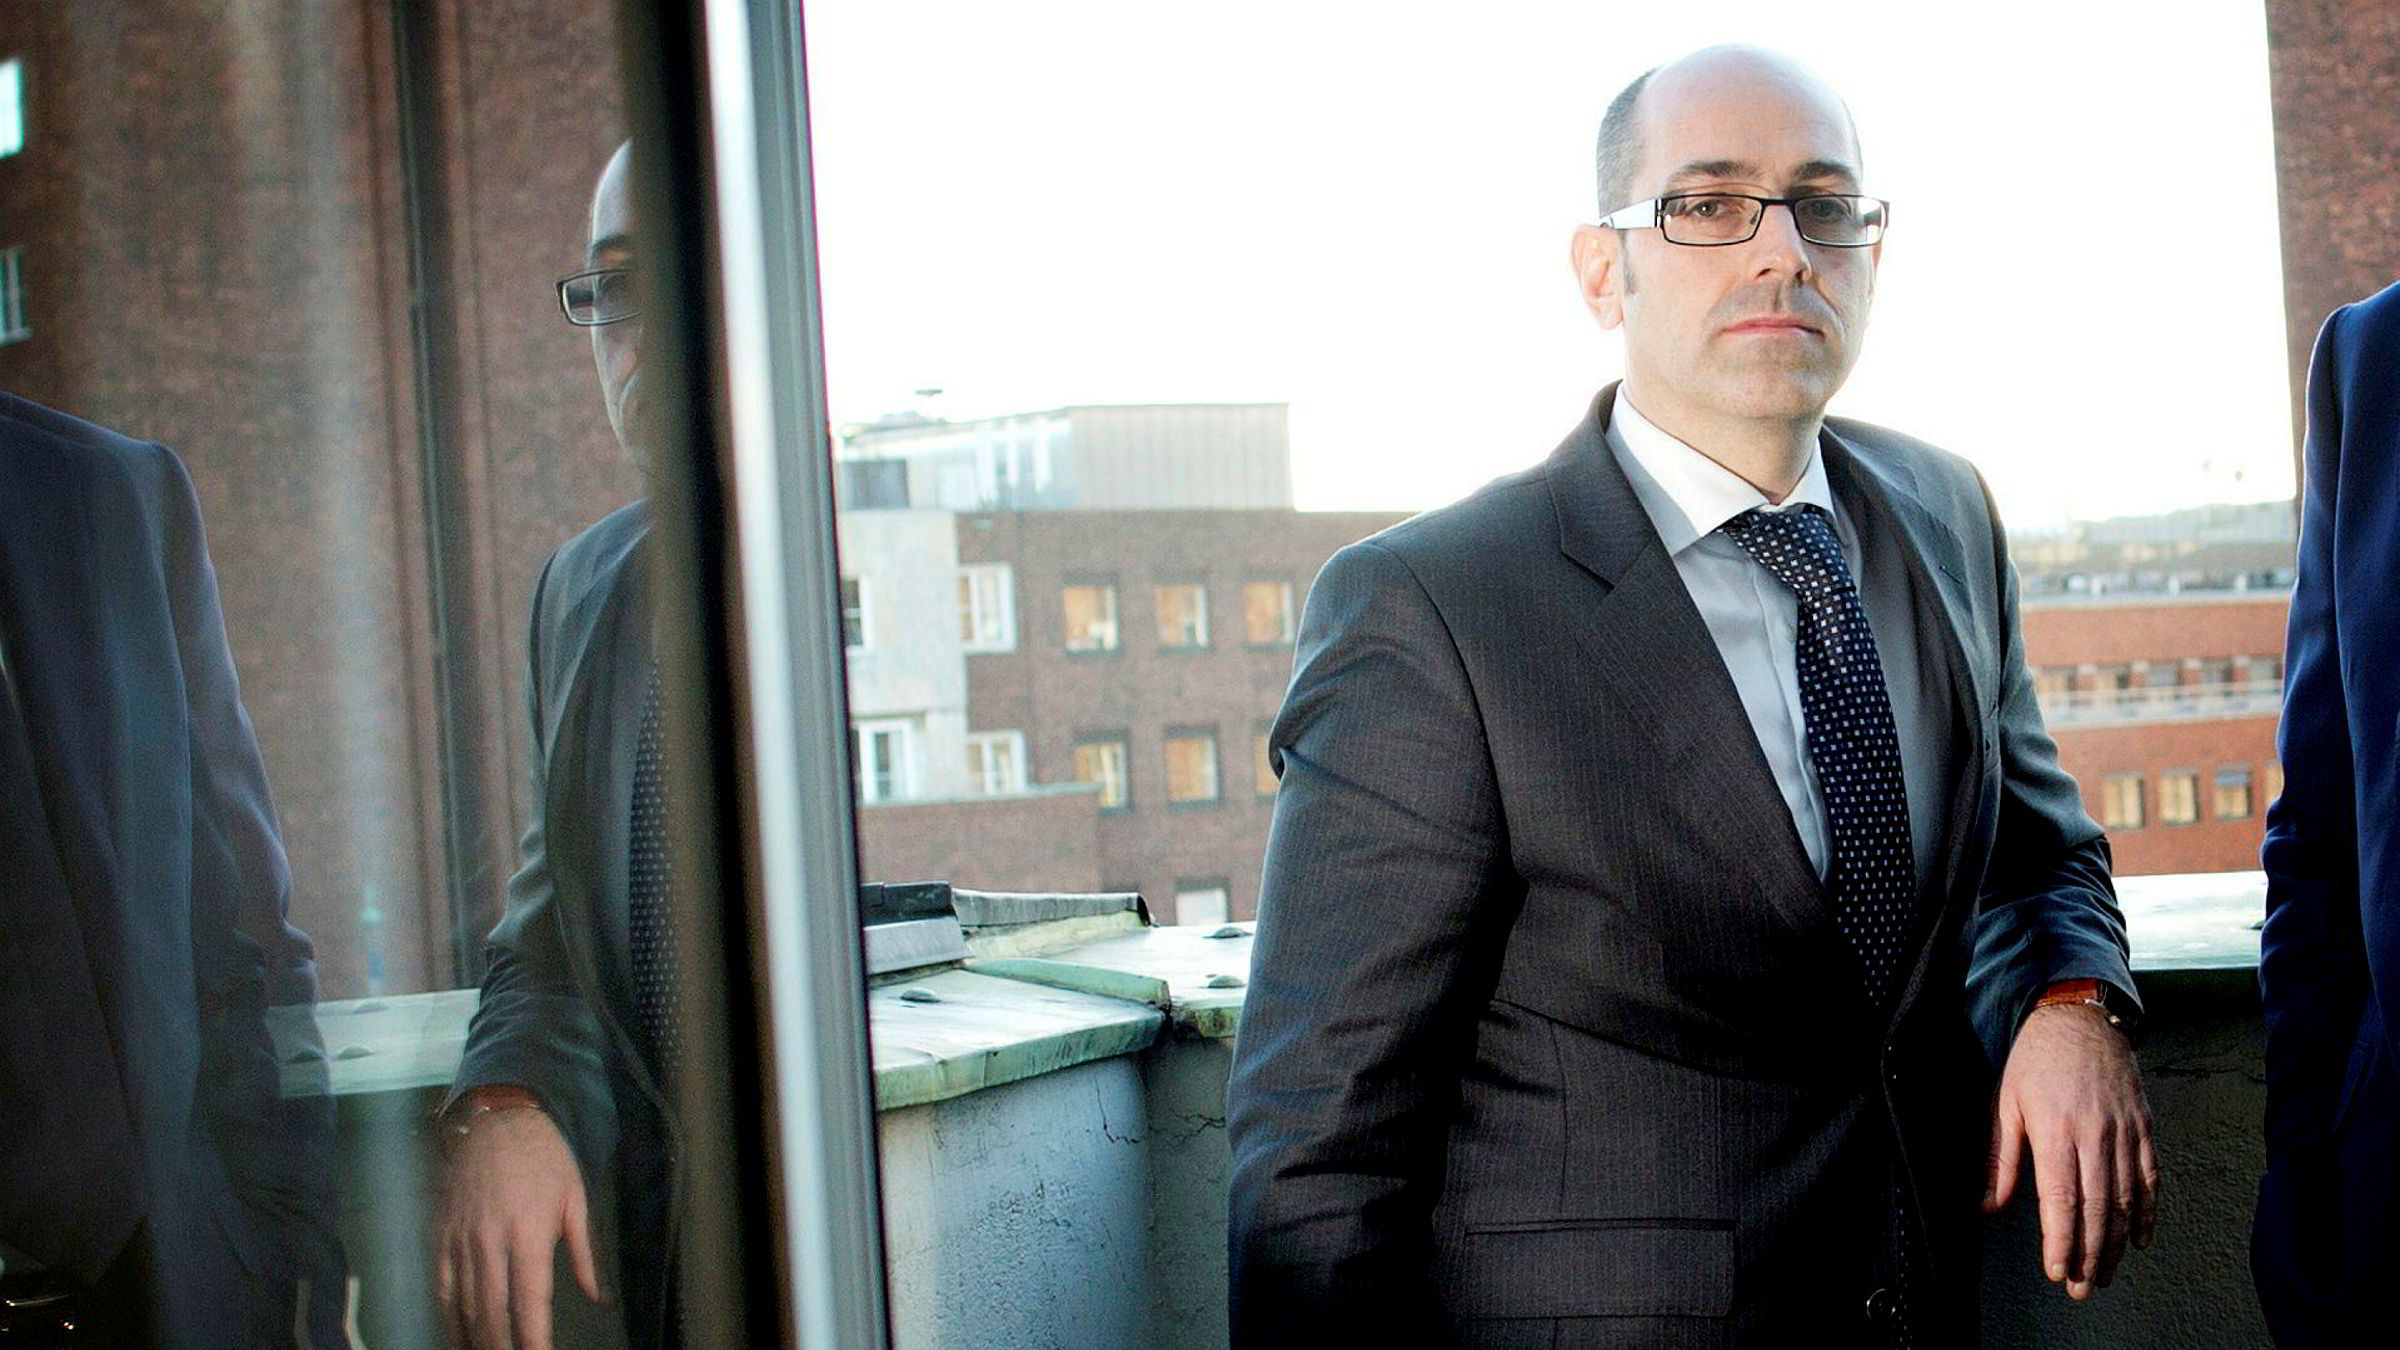 Skatteadvokat Thomas S. Farhang i advokatfirmaet Kvale har størst inntekt blant advokatene i Norge.